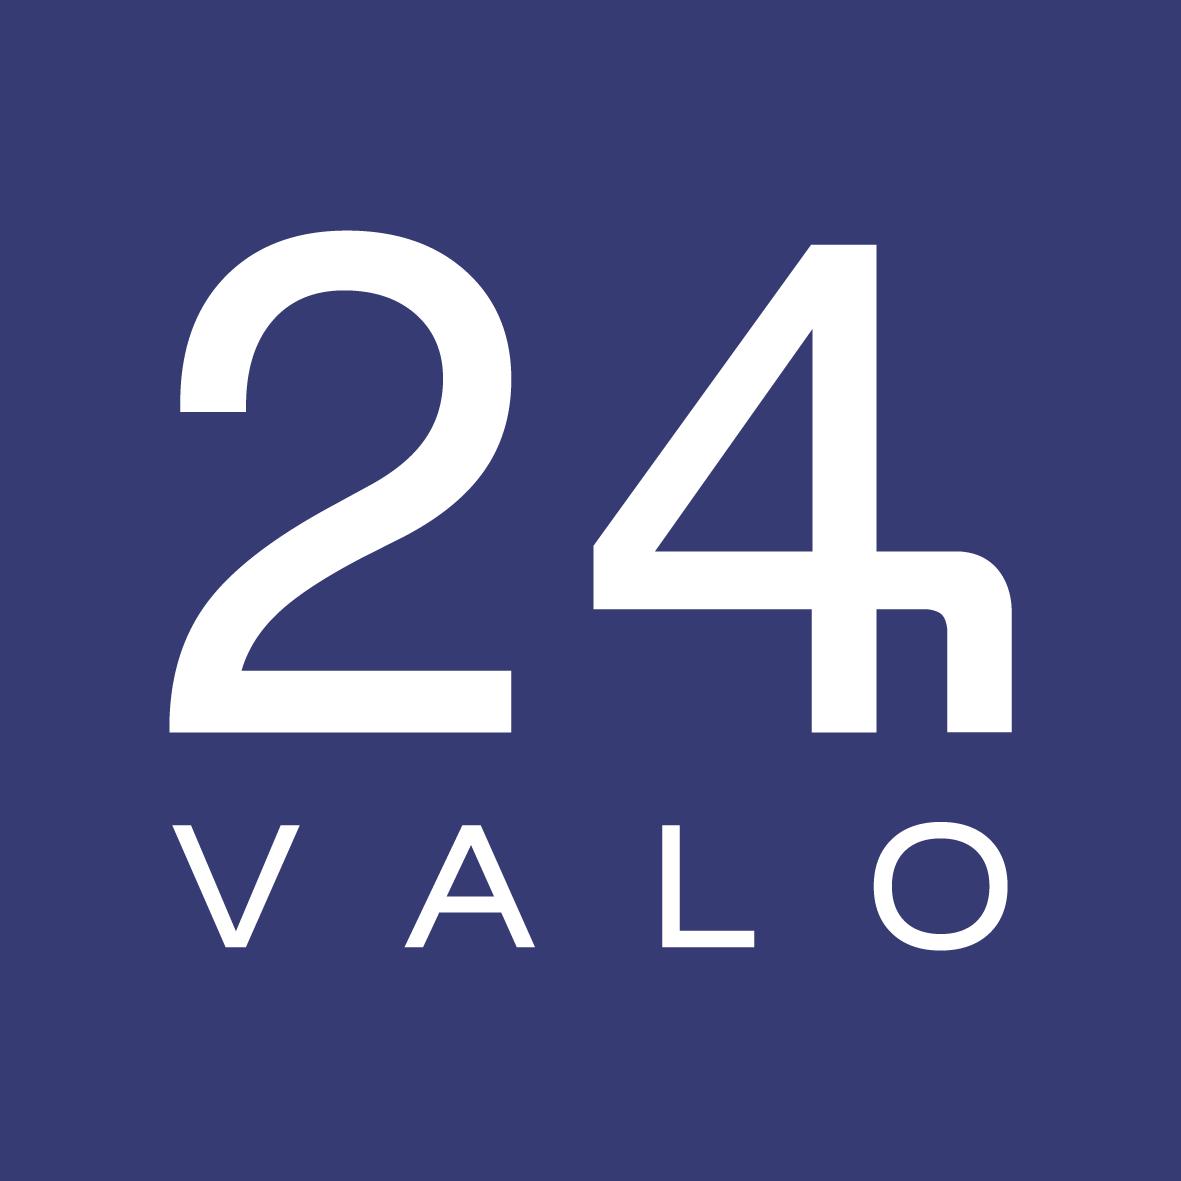 VALO_LOGO_MUSTIKKA_RGB